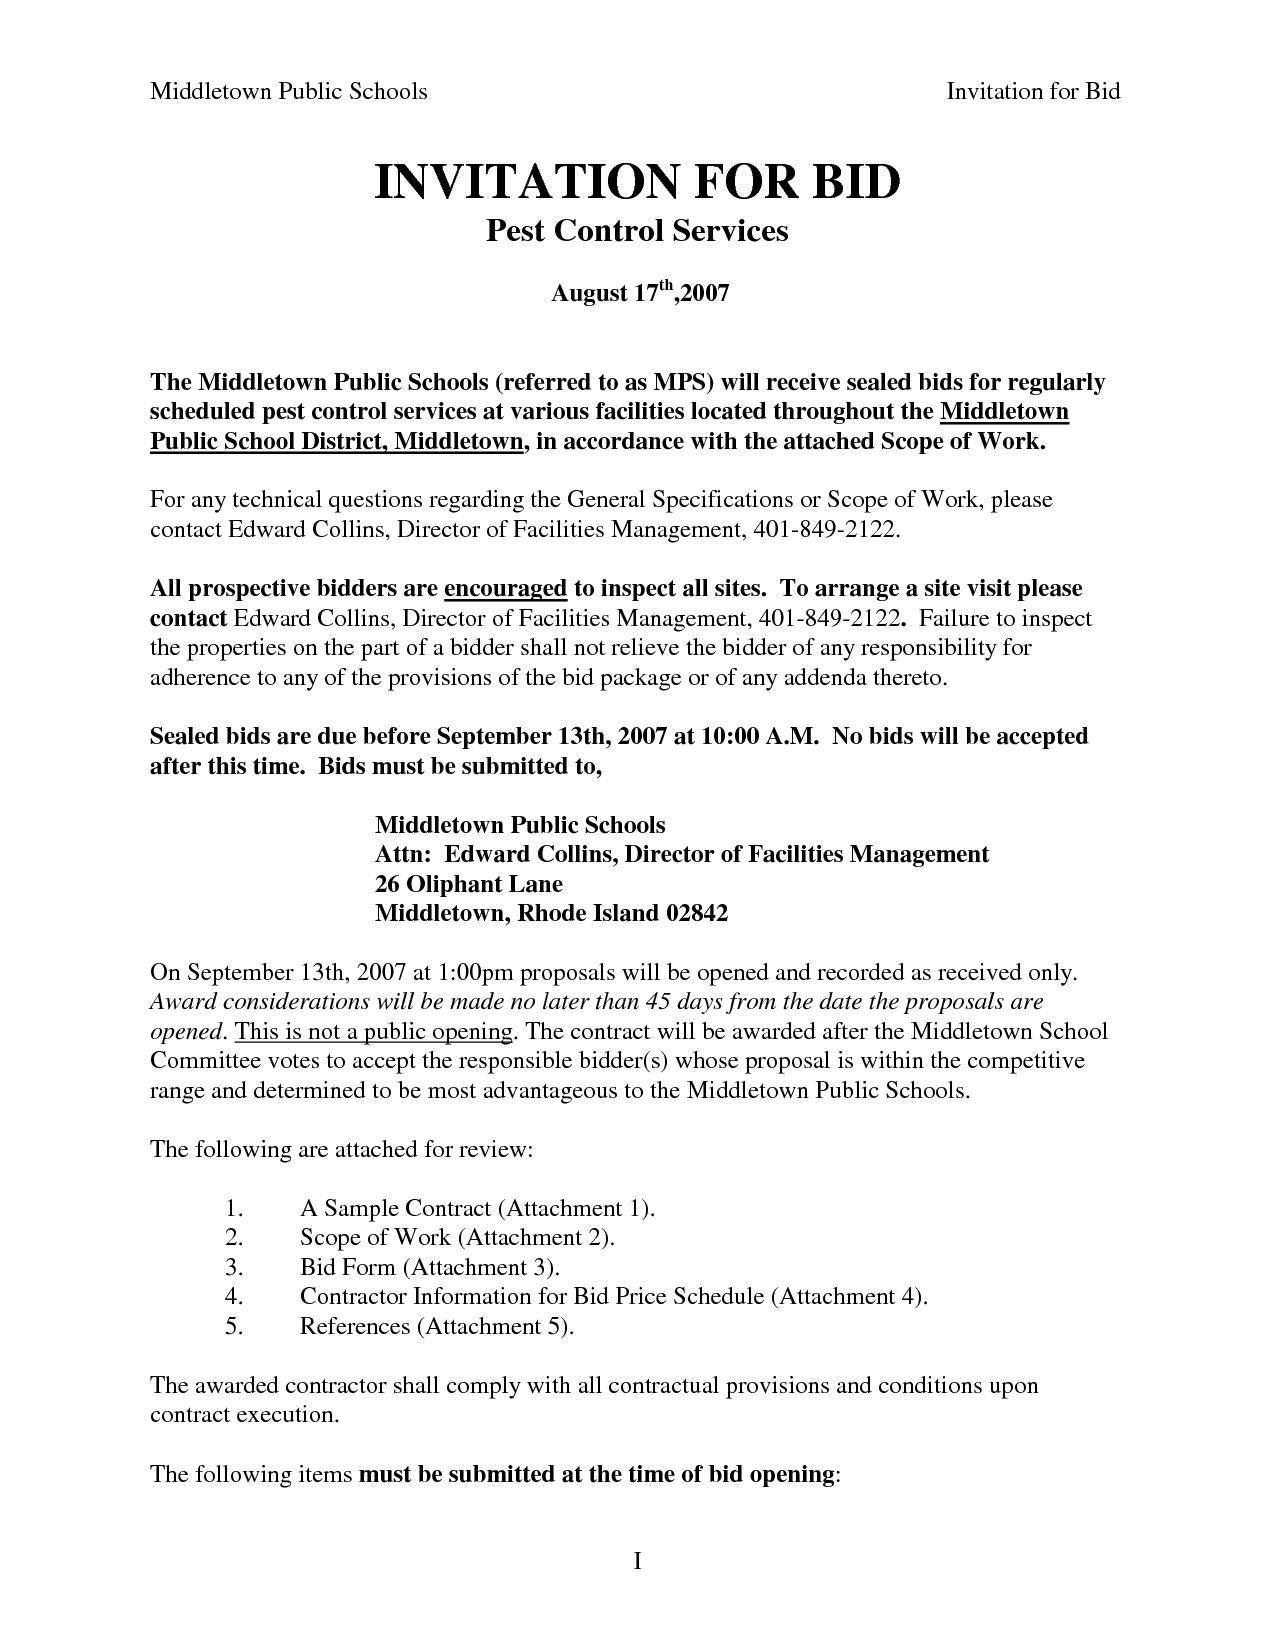 pest management plan template - pest control invoice invoice template ideas